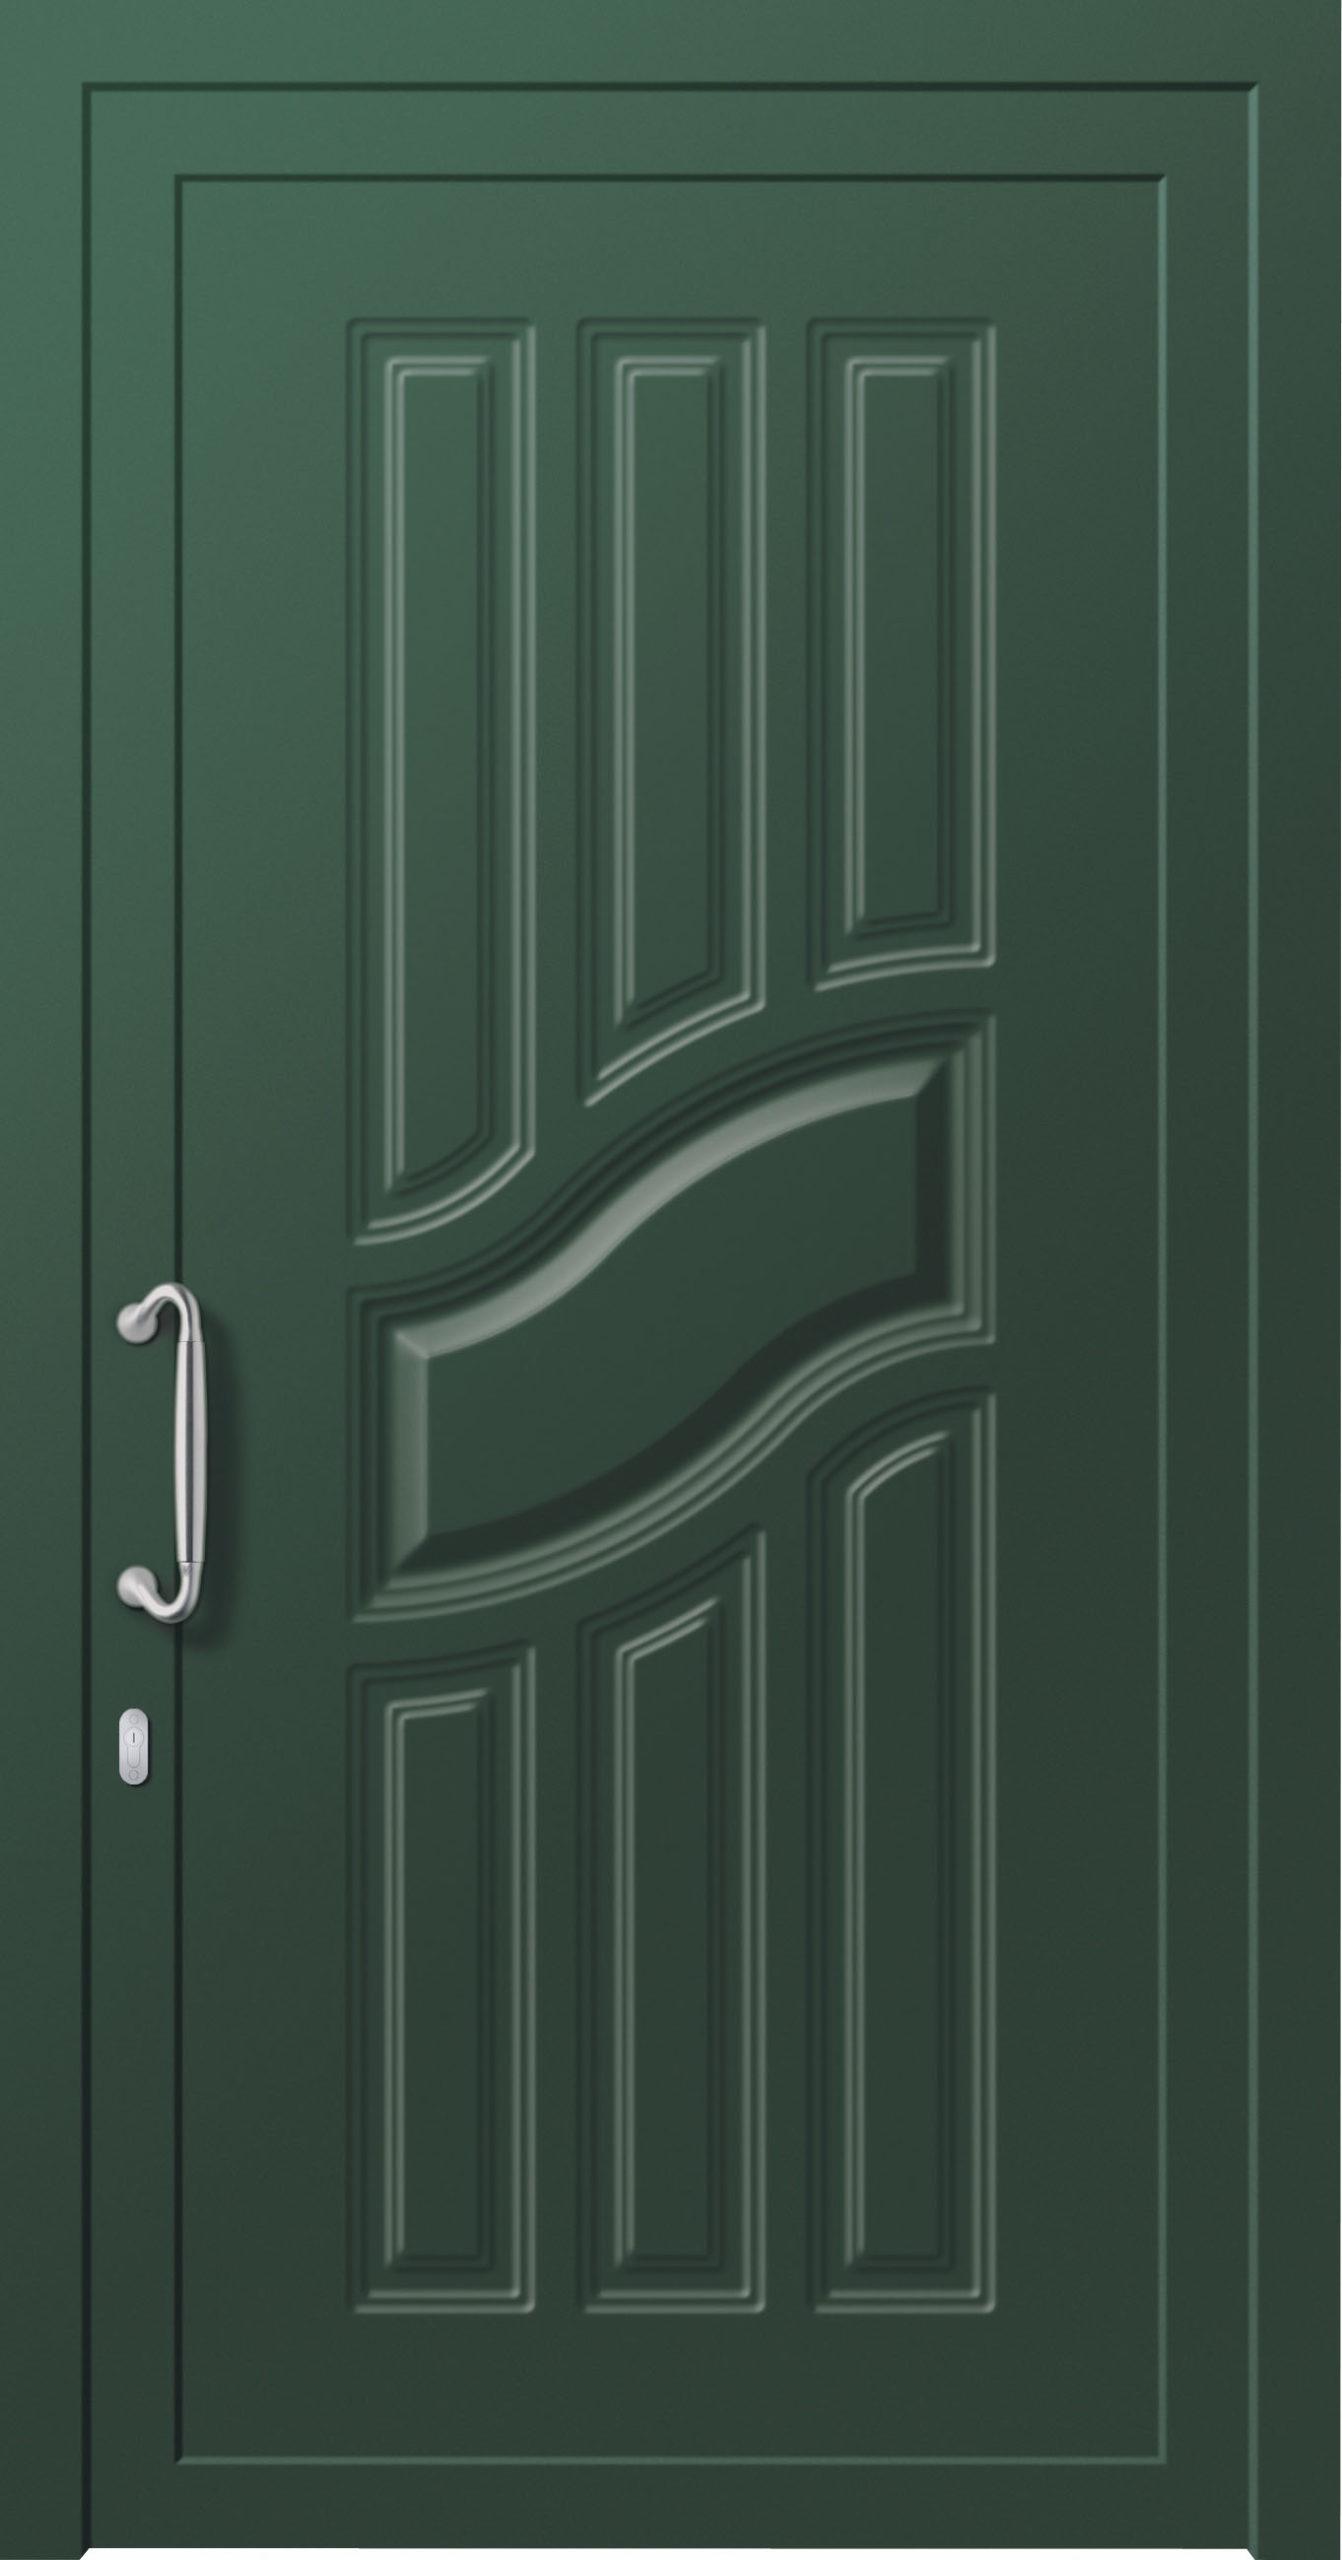 Entry Doors Linea Classica 6